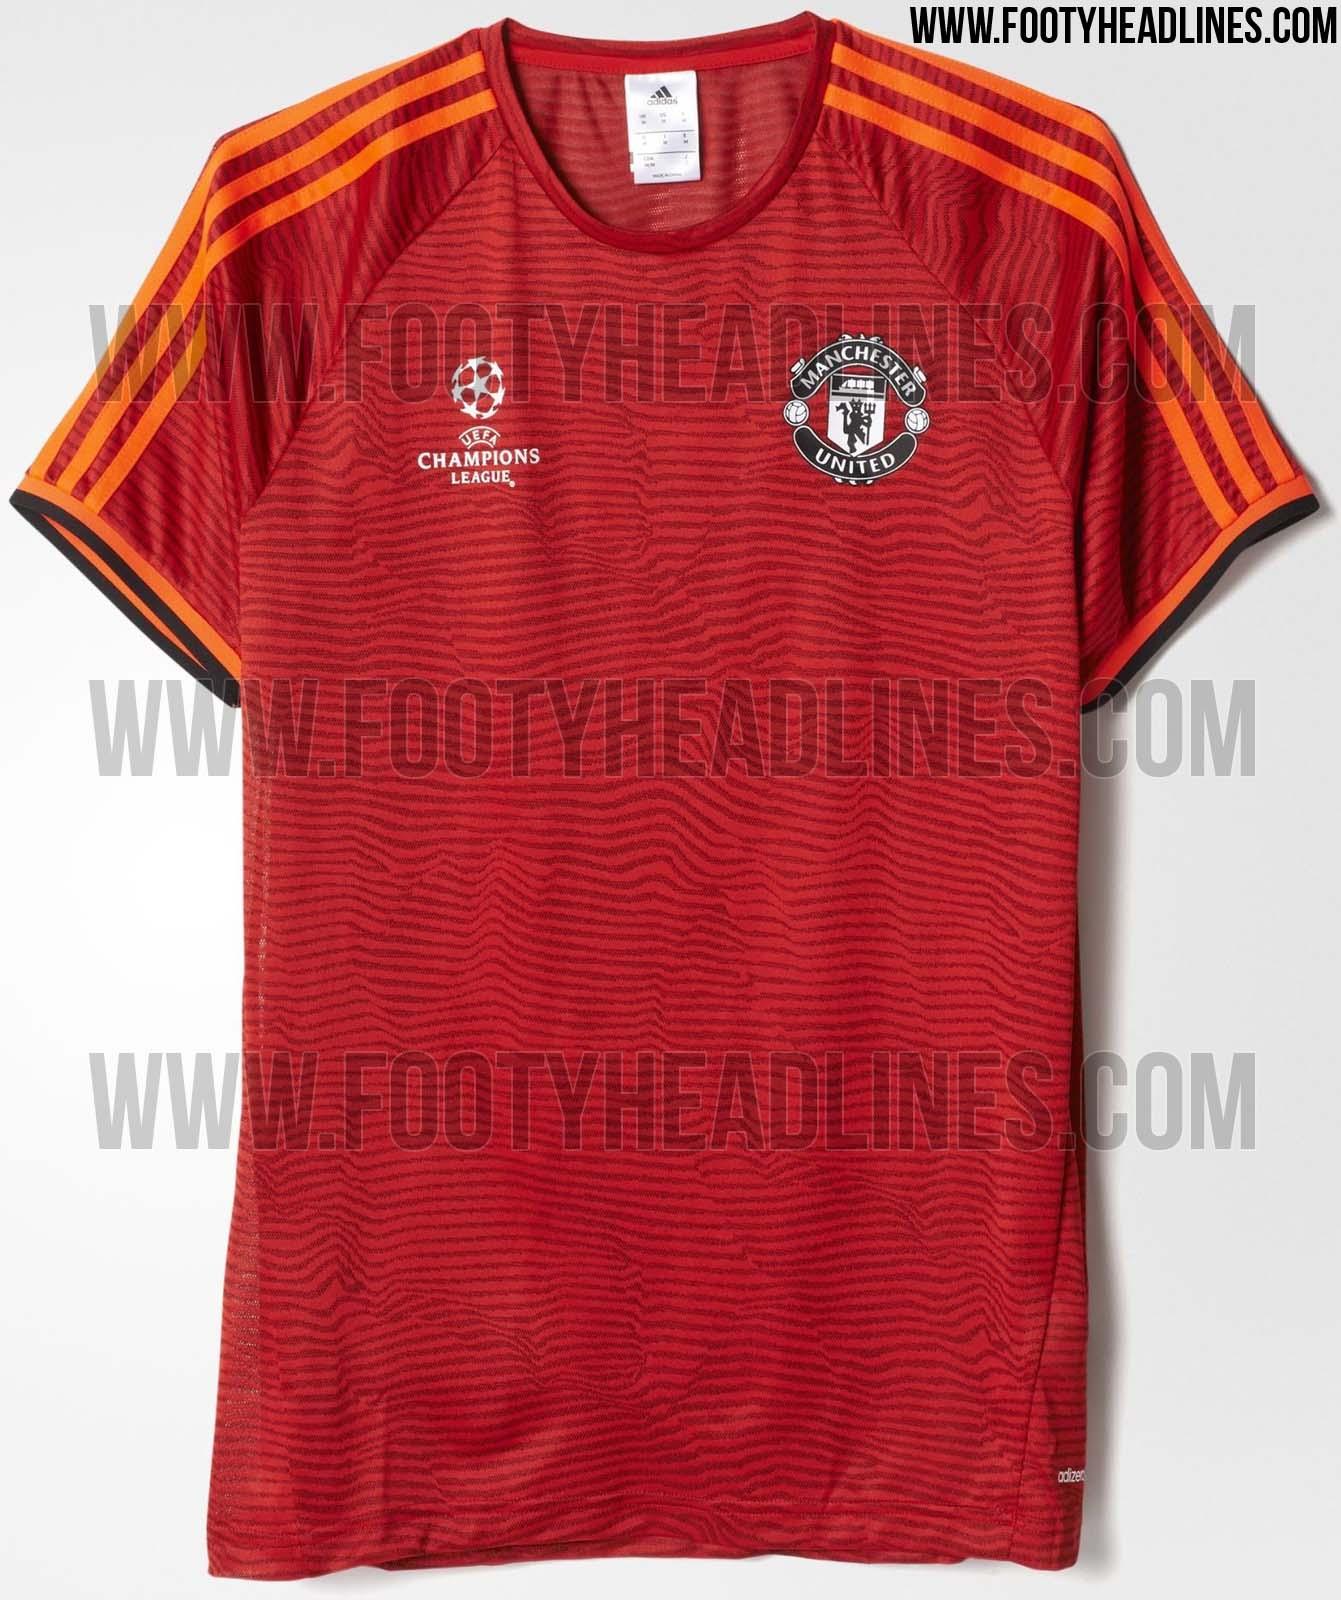 cheap for discount e20e9 e6745 manchester united champions league jersey